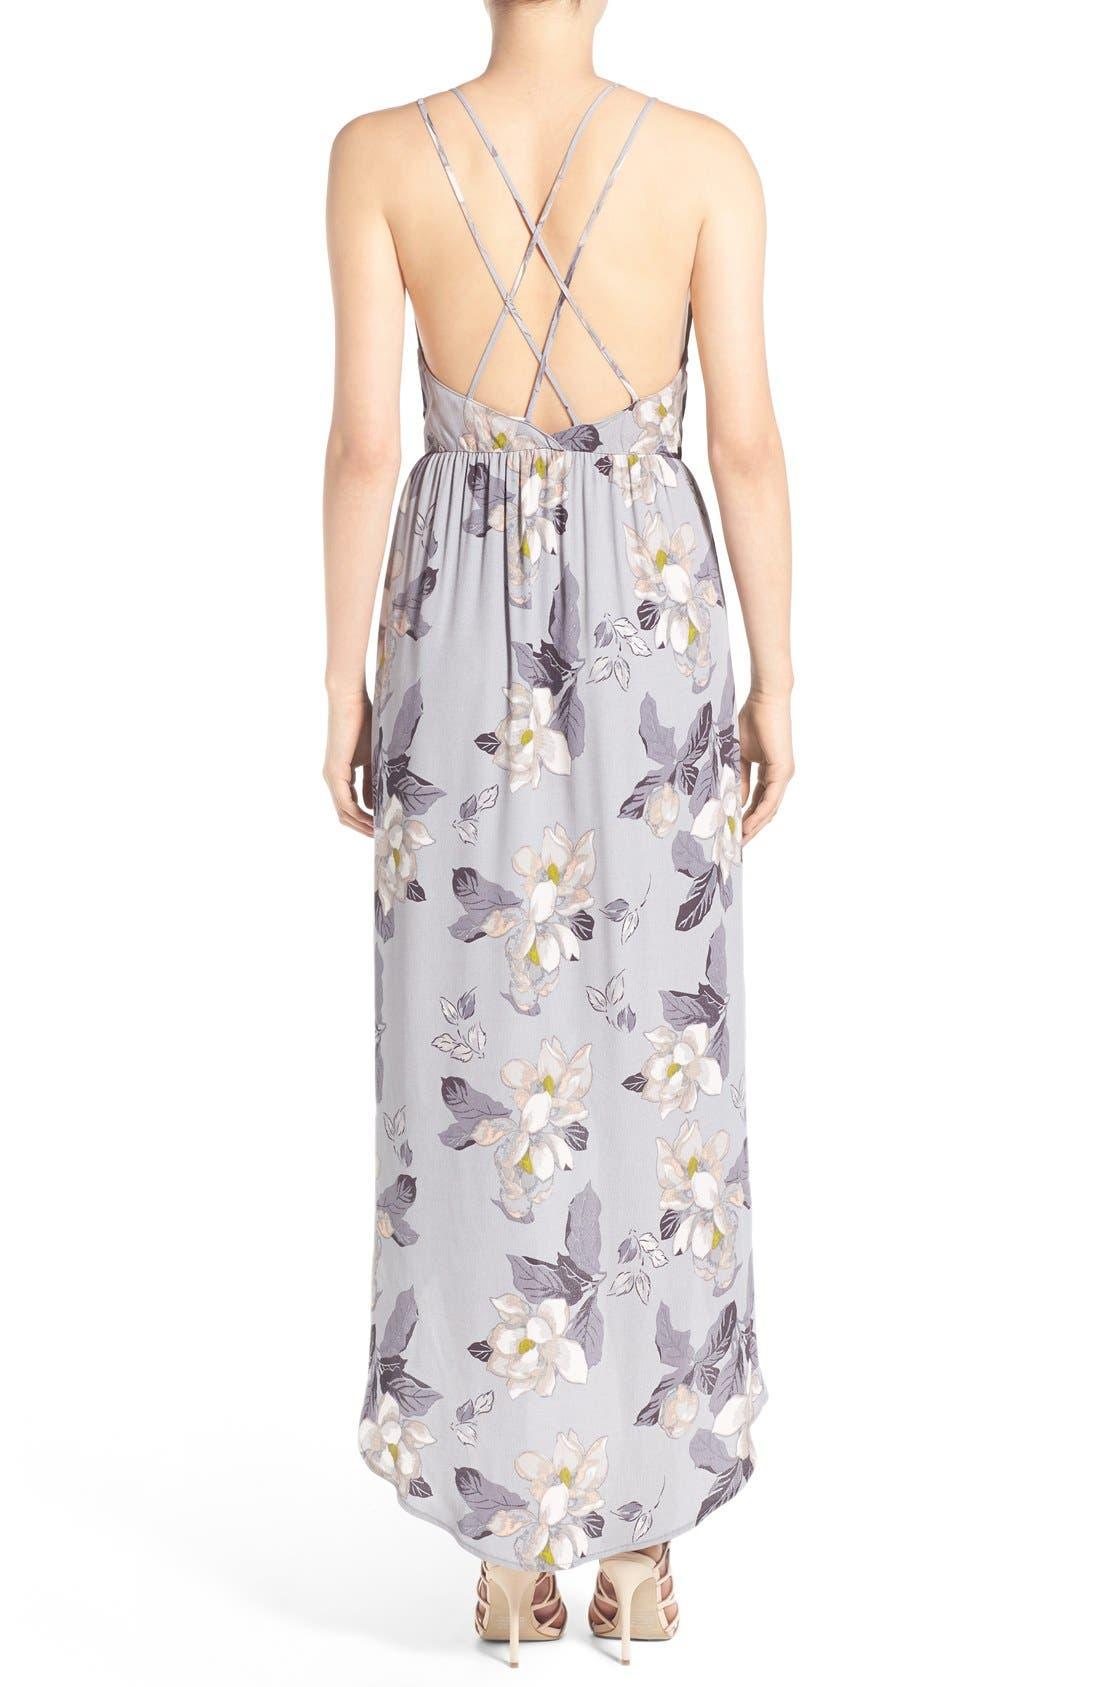 ASTR Ruffle Surplice High/Low Maxi Dress,                             Alternate thumbnail 2, color,                             Grey Multi Floral